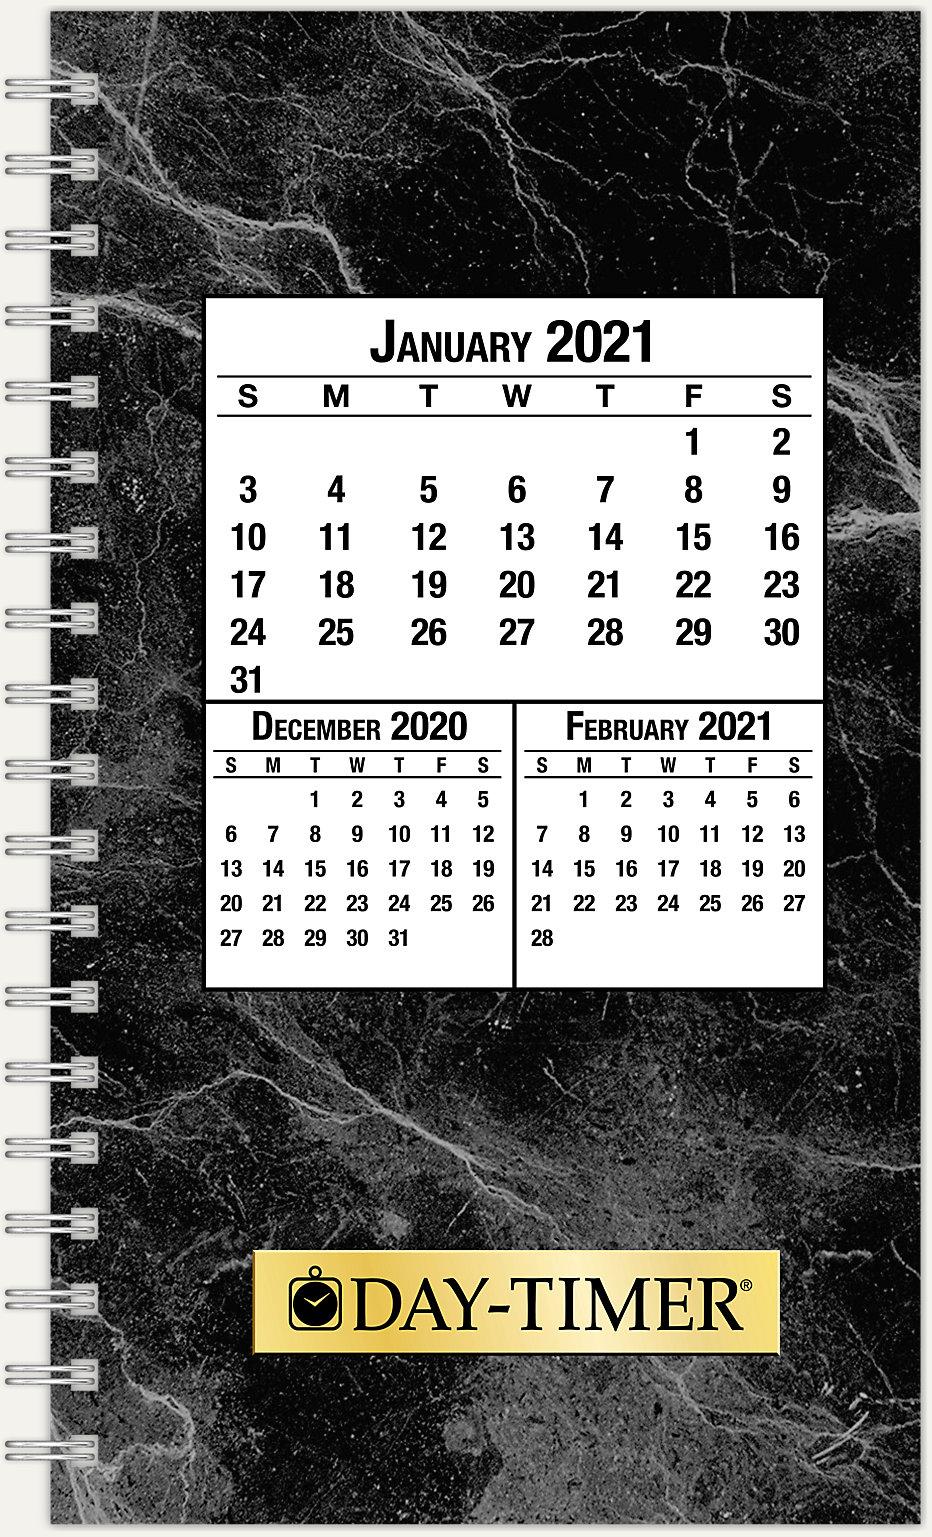 JAN Monthly AGENDA Pocket Planner Calendar Black 14 MONTHS 2PG SPREAD 2020 DEC